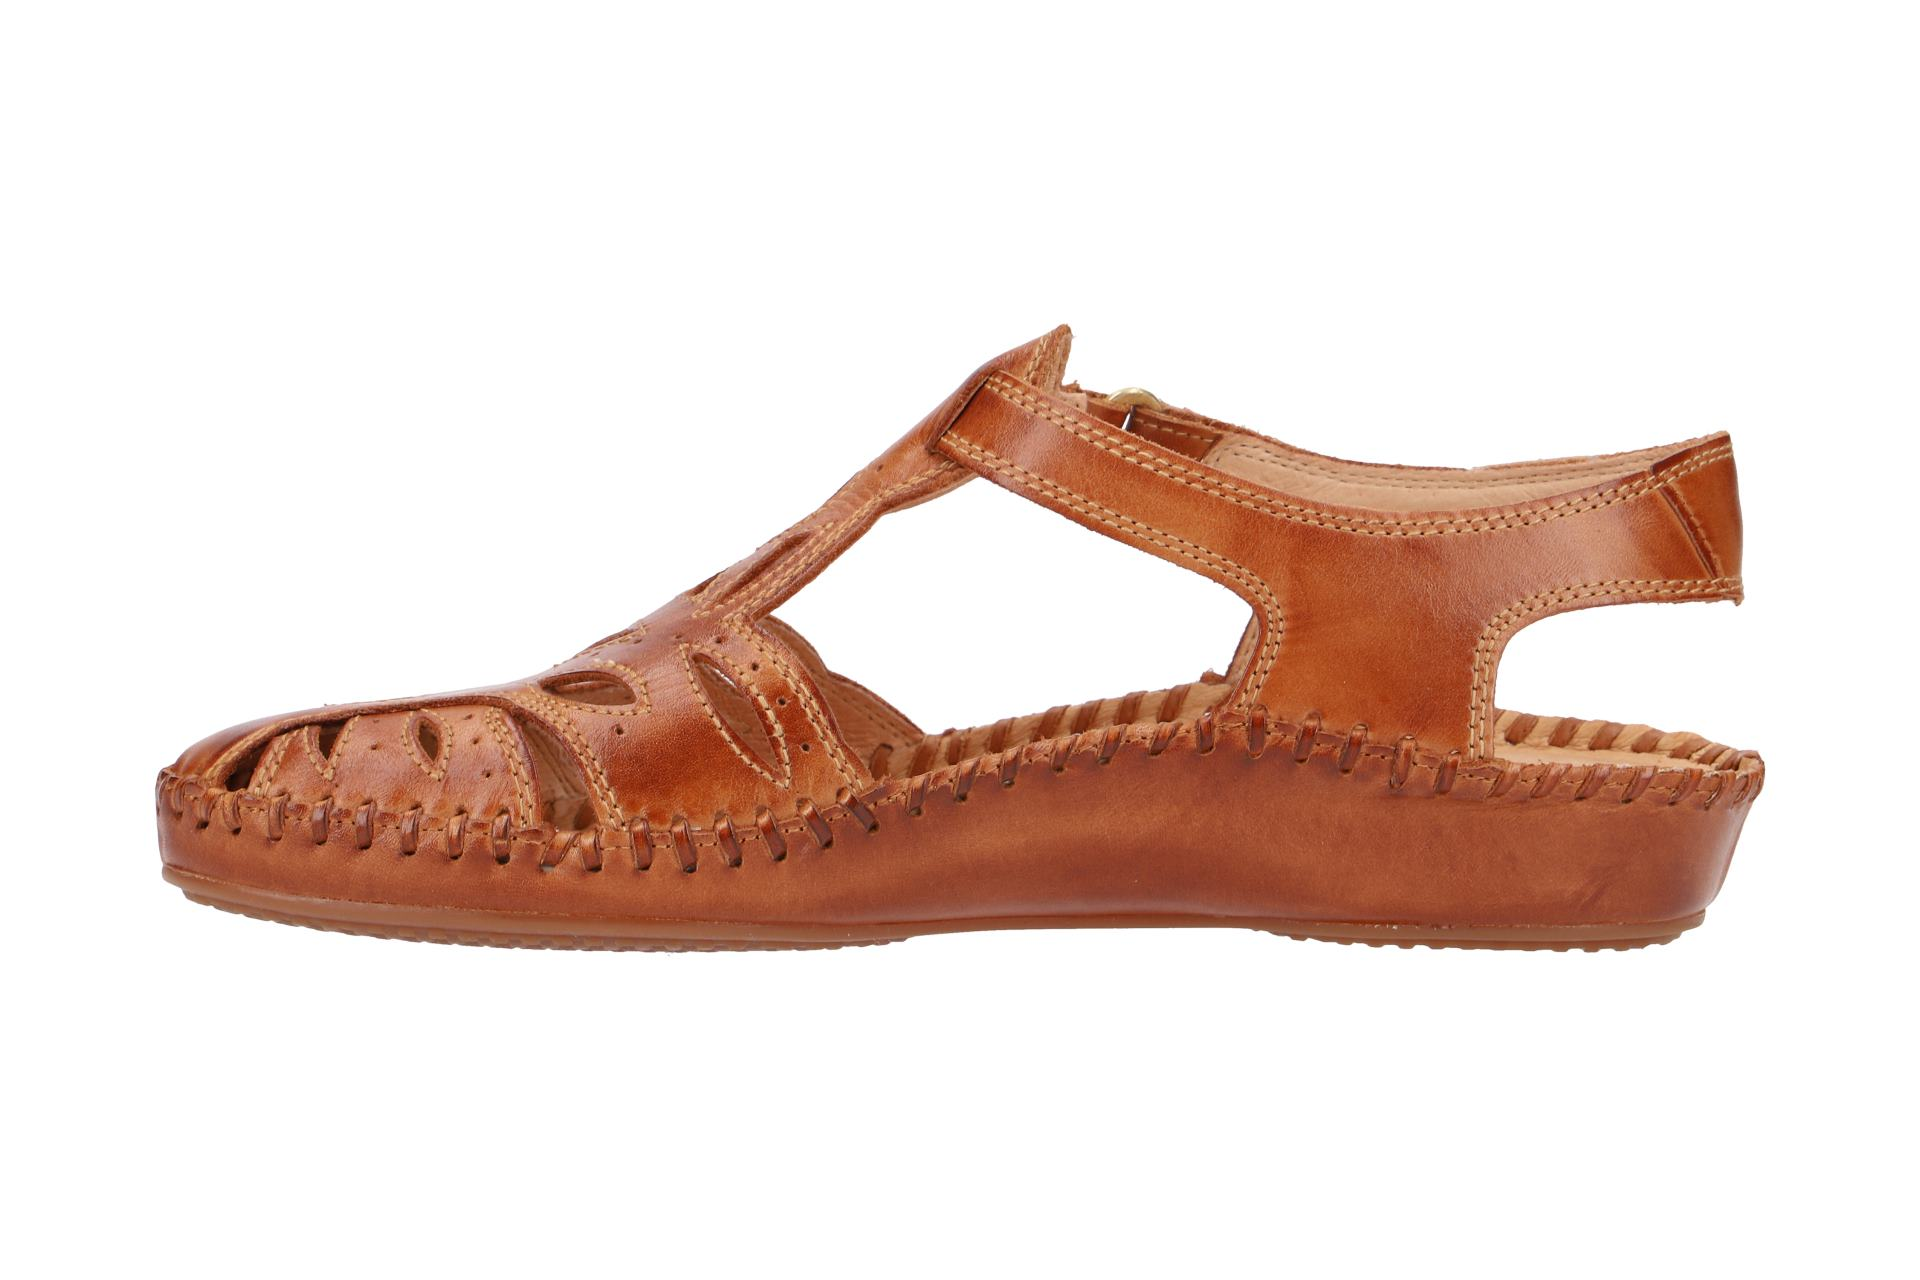 pikolinos schuhe p vallarta braun damen sandale sandaletten 655 8312l brandy ebay. Black Bedroom Furniture Sets. Home Design Ideas